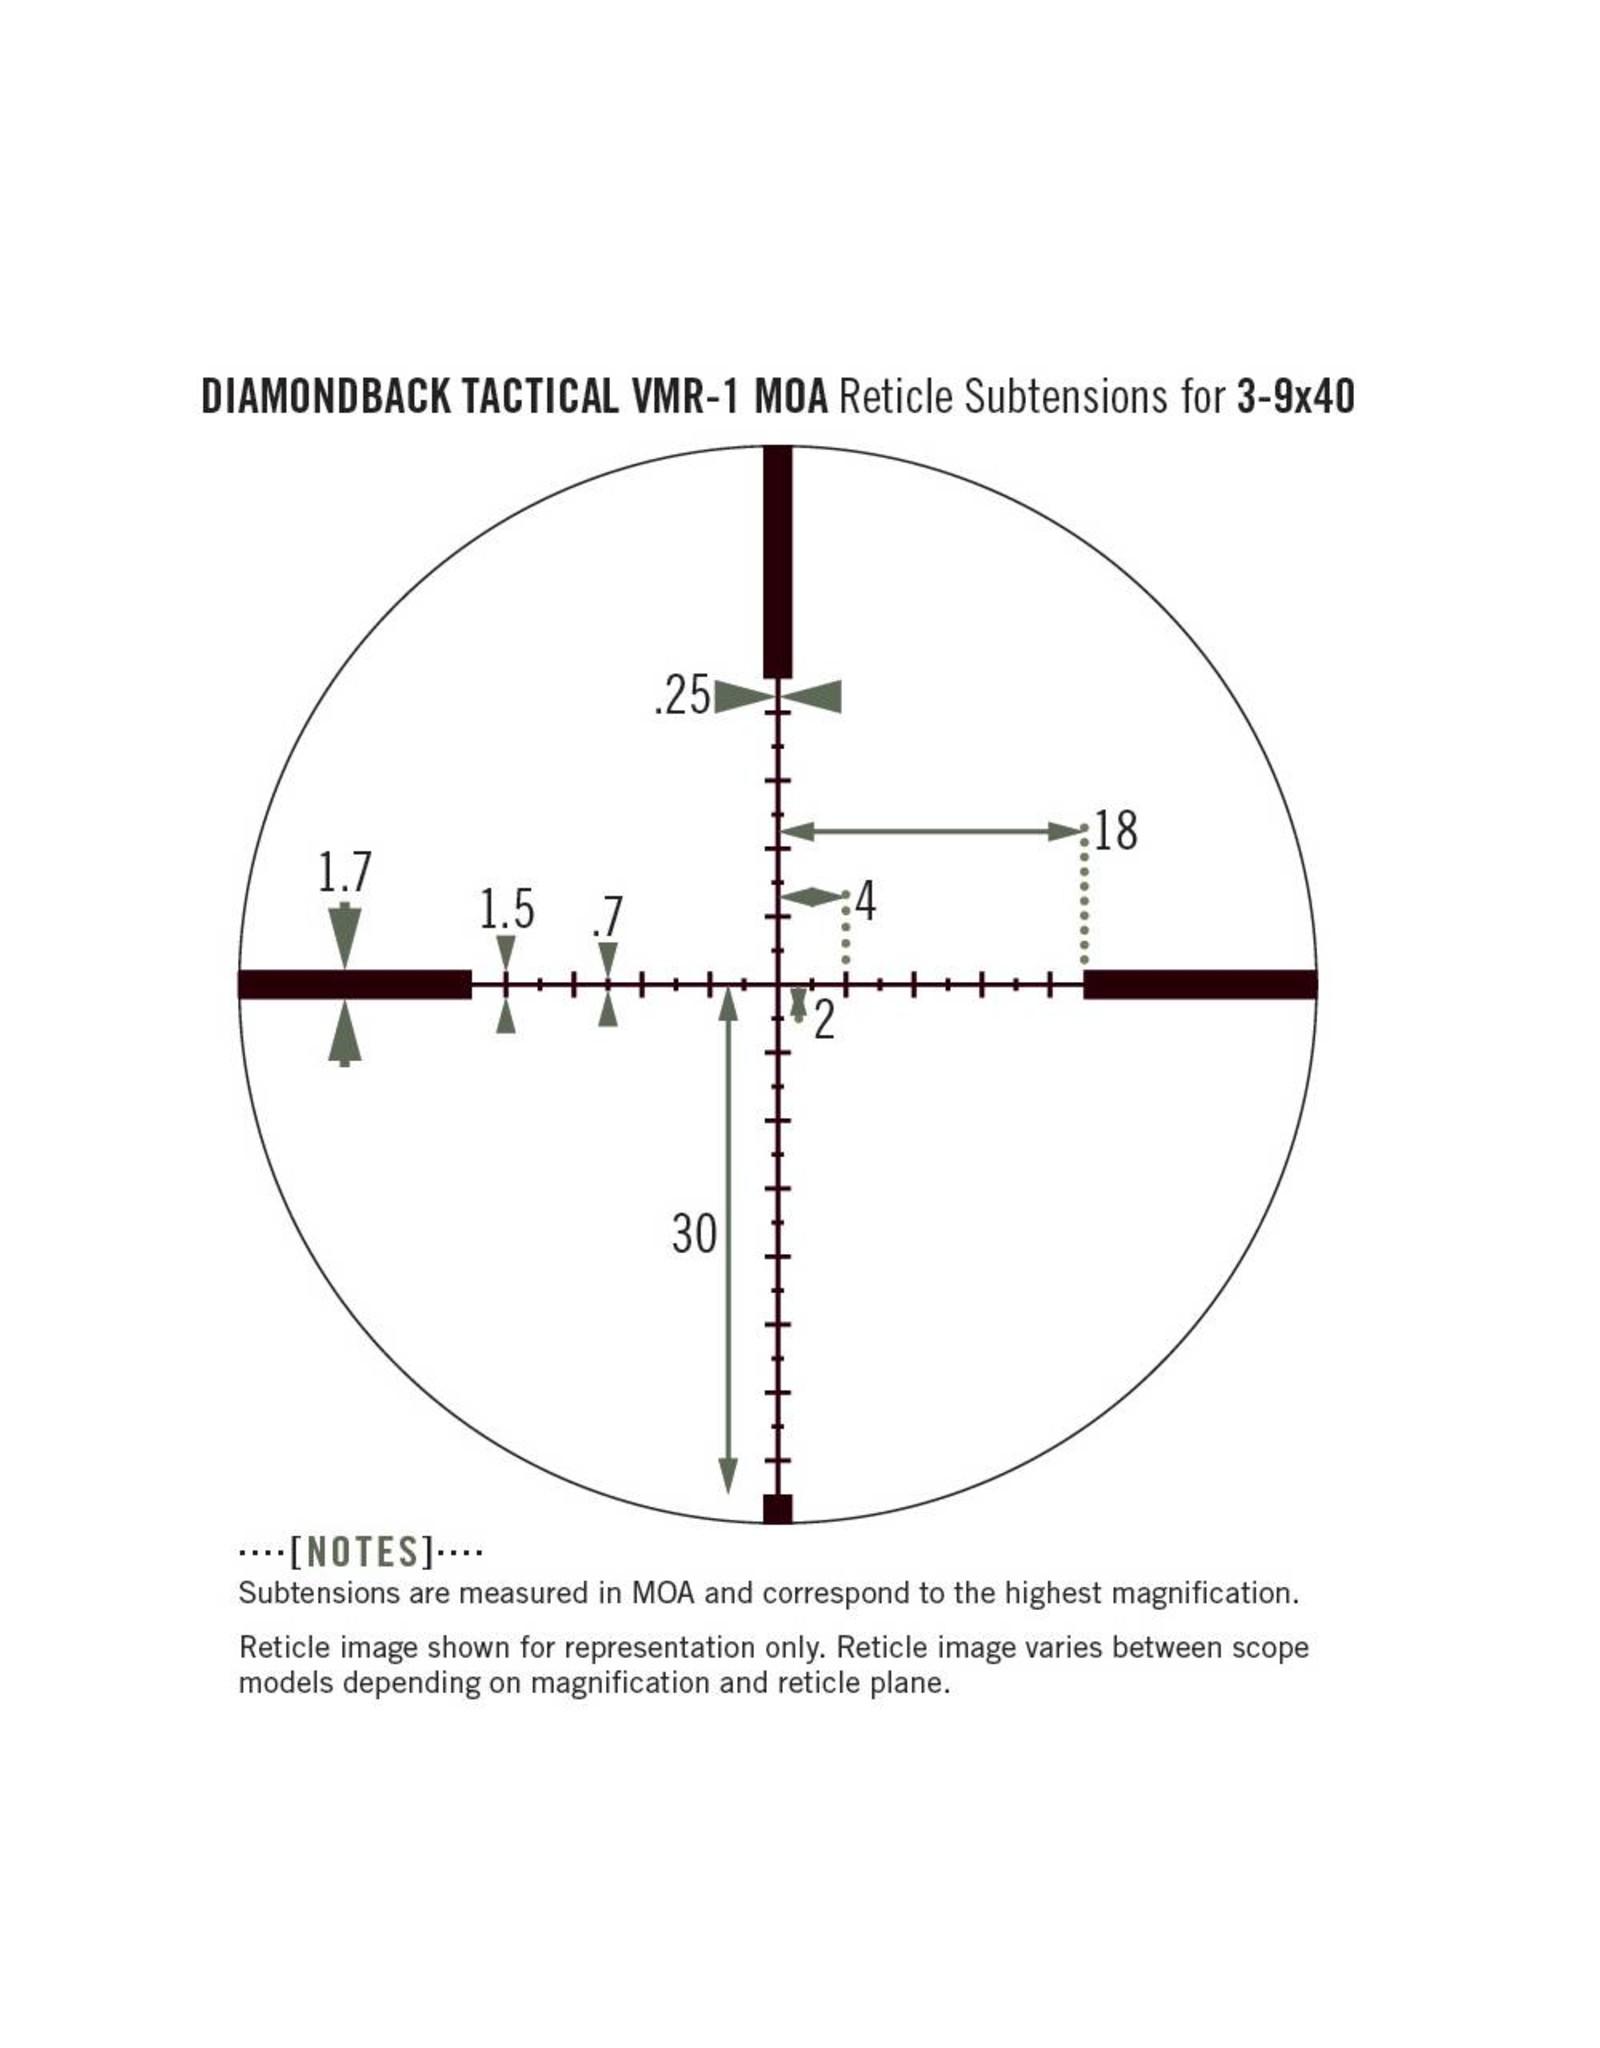 Vortex Vortex Diamondback Tactical 3-9x40 Riflescope with VMR-1